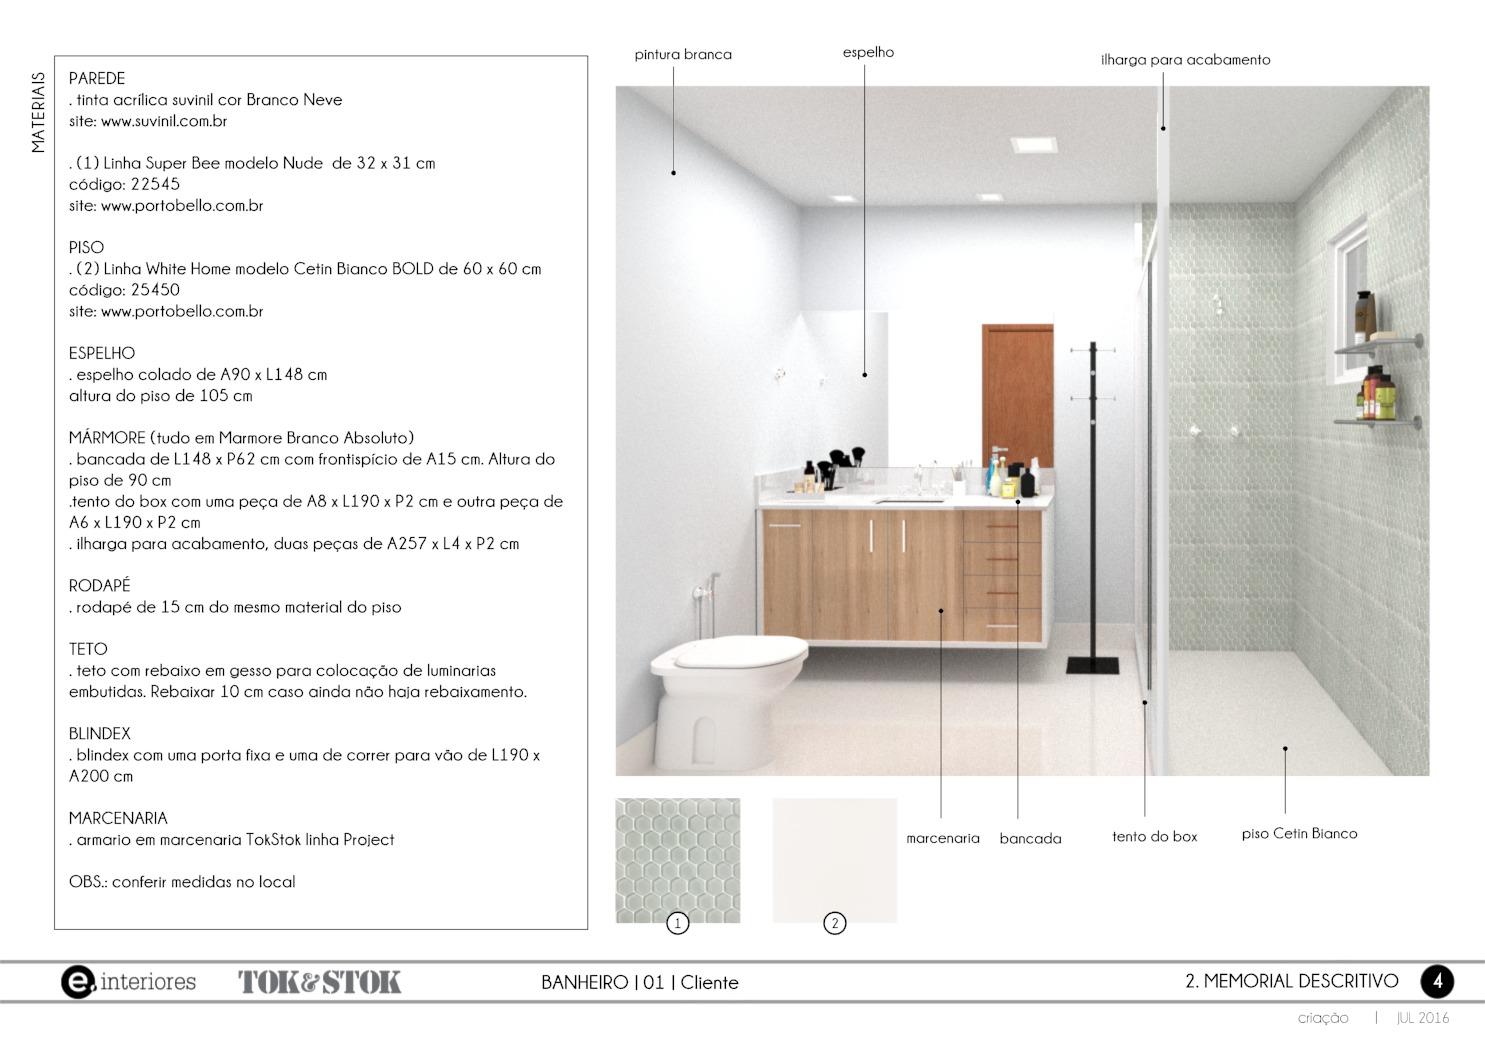 E-Interiores: Next-generation interior design with Blender — blender.org